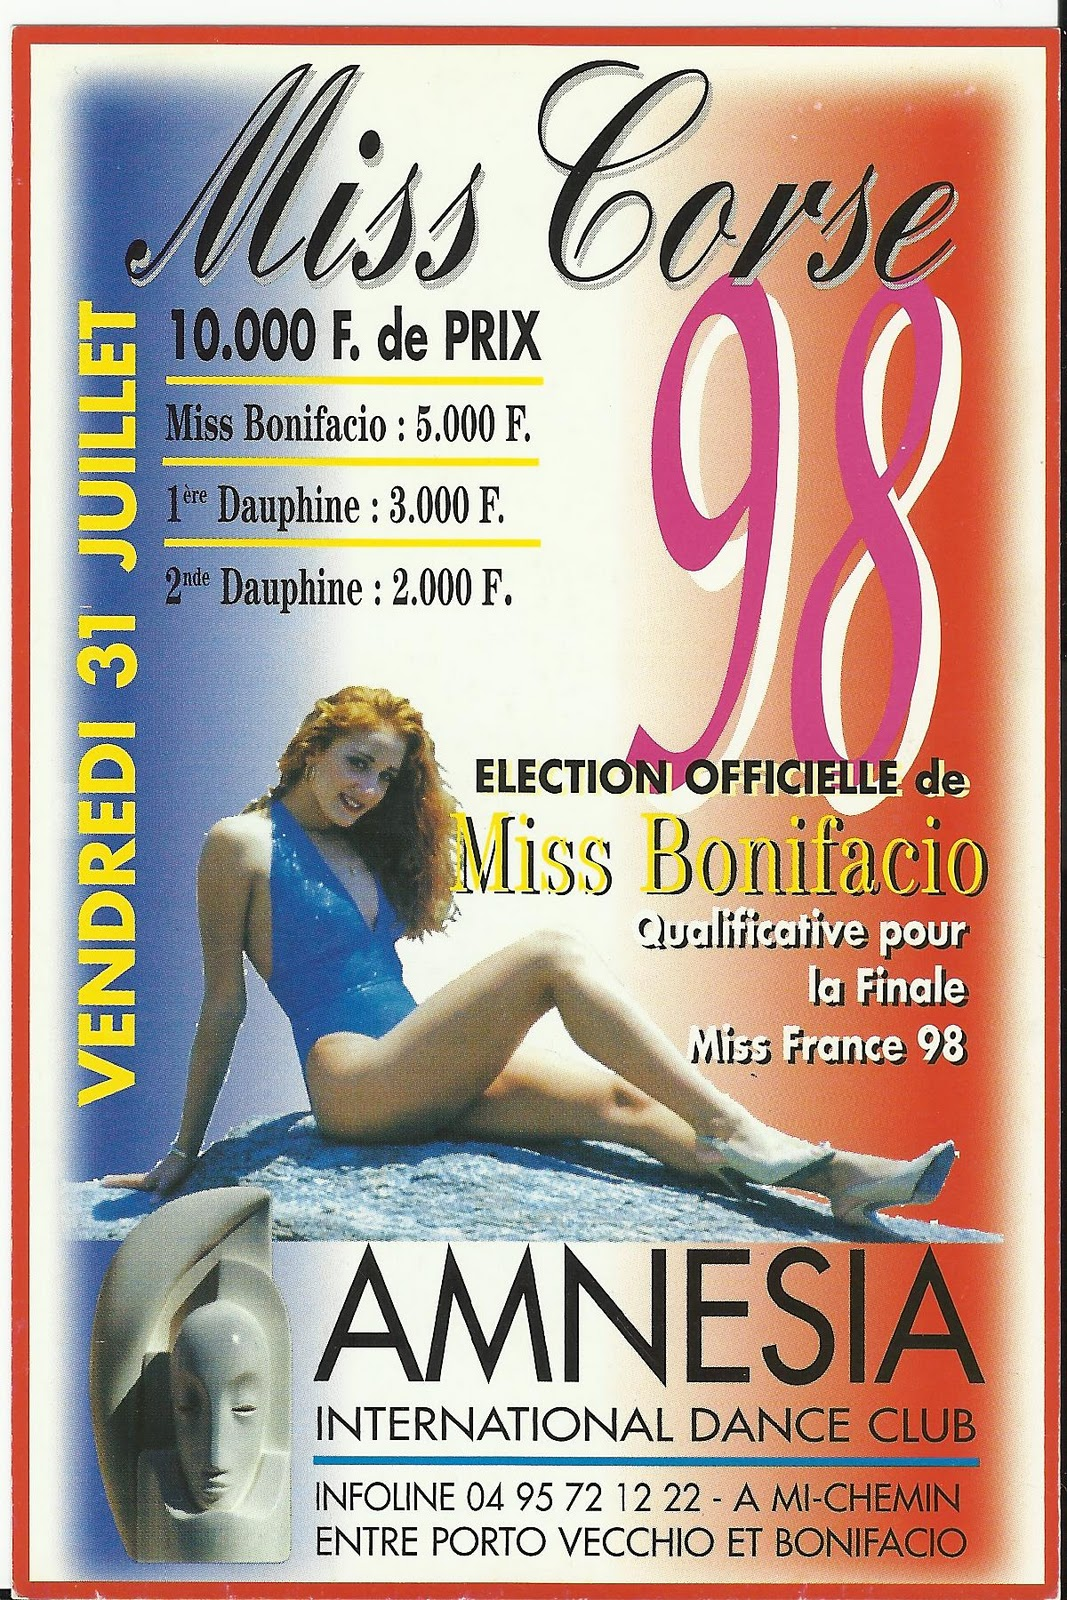 amnesia bonifacio corsica les flyers amnesia summer 98 revival. Black Bedroom Furniture Sets. Home Design Ideas